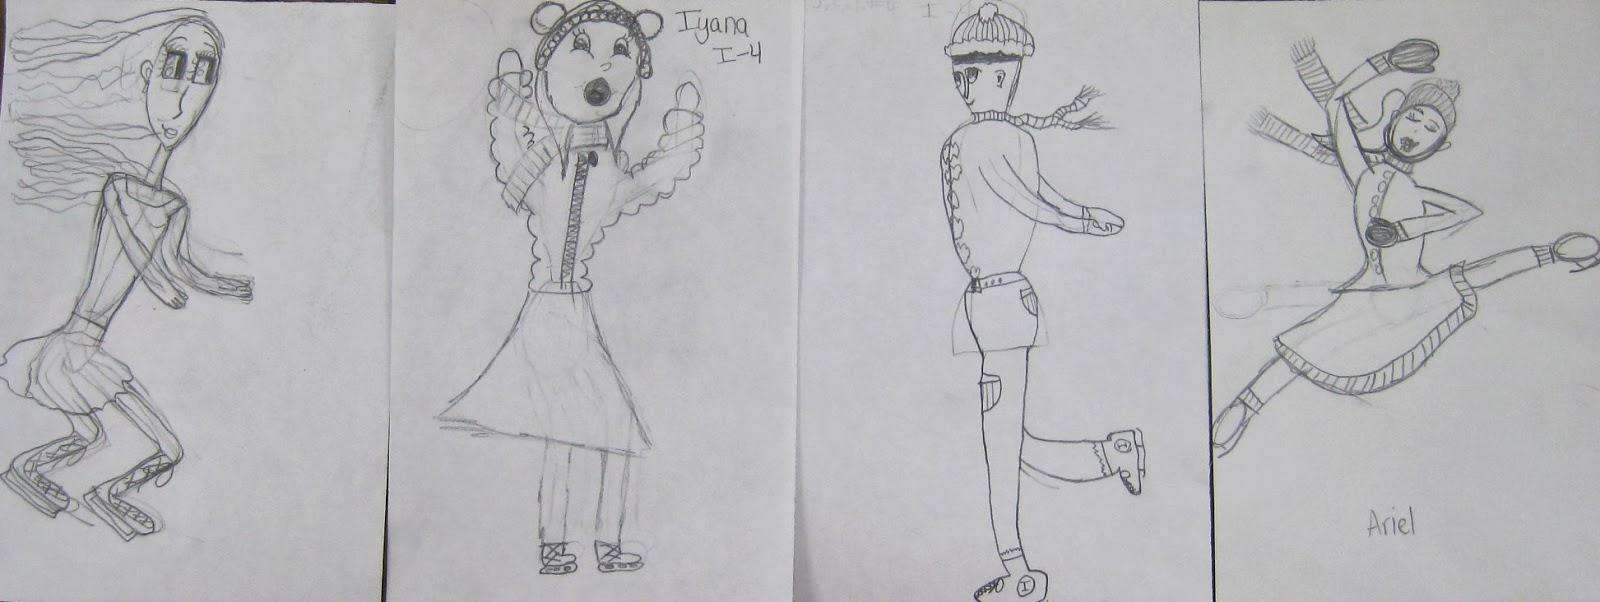 Cassie Stephens: teaching figure drawing to kids